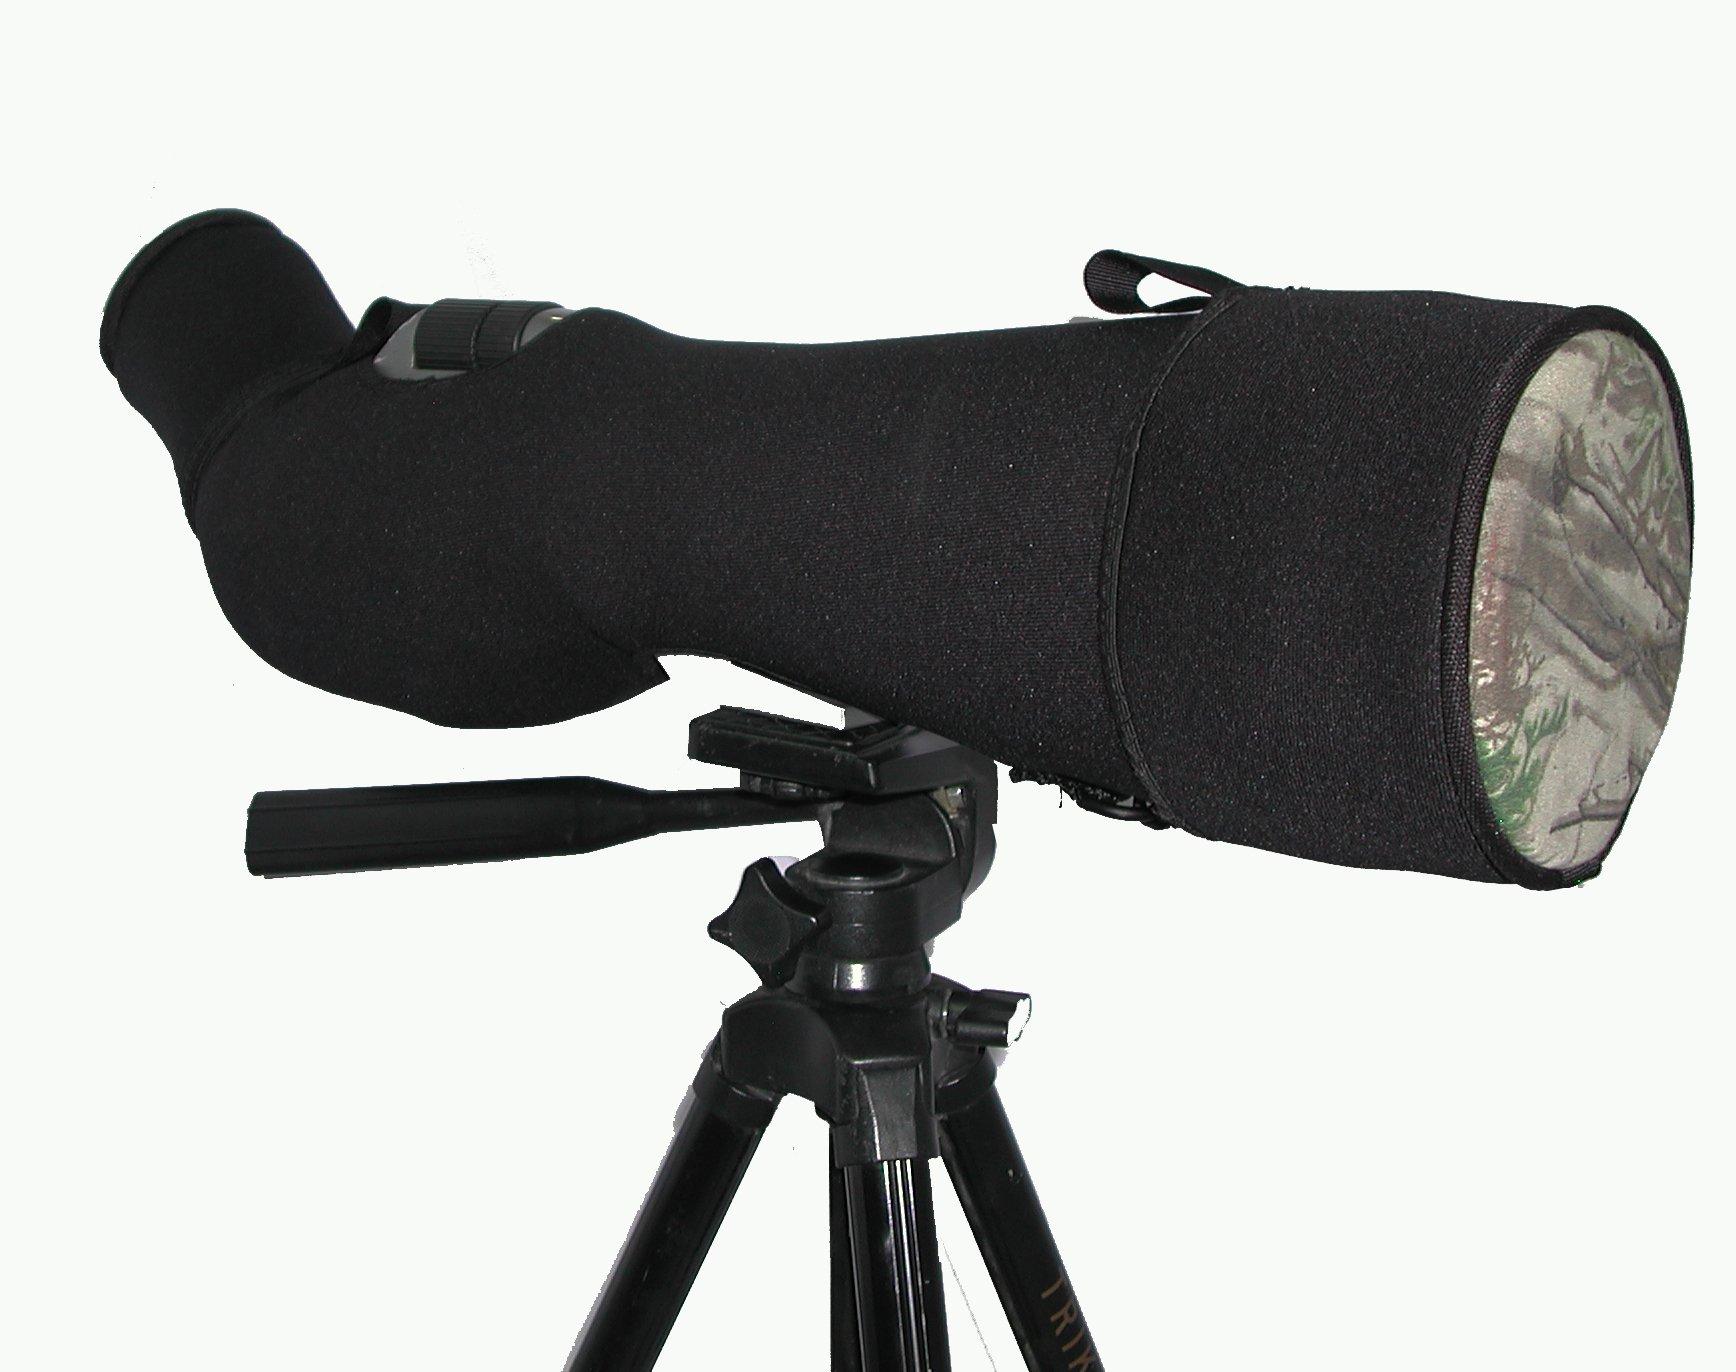 Snugfit Scope Skin Swarovski (80-mm, Angled) by Sportsman's Outdoor Products